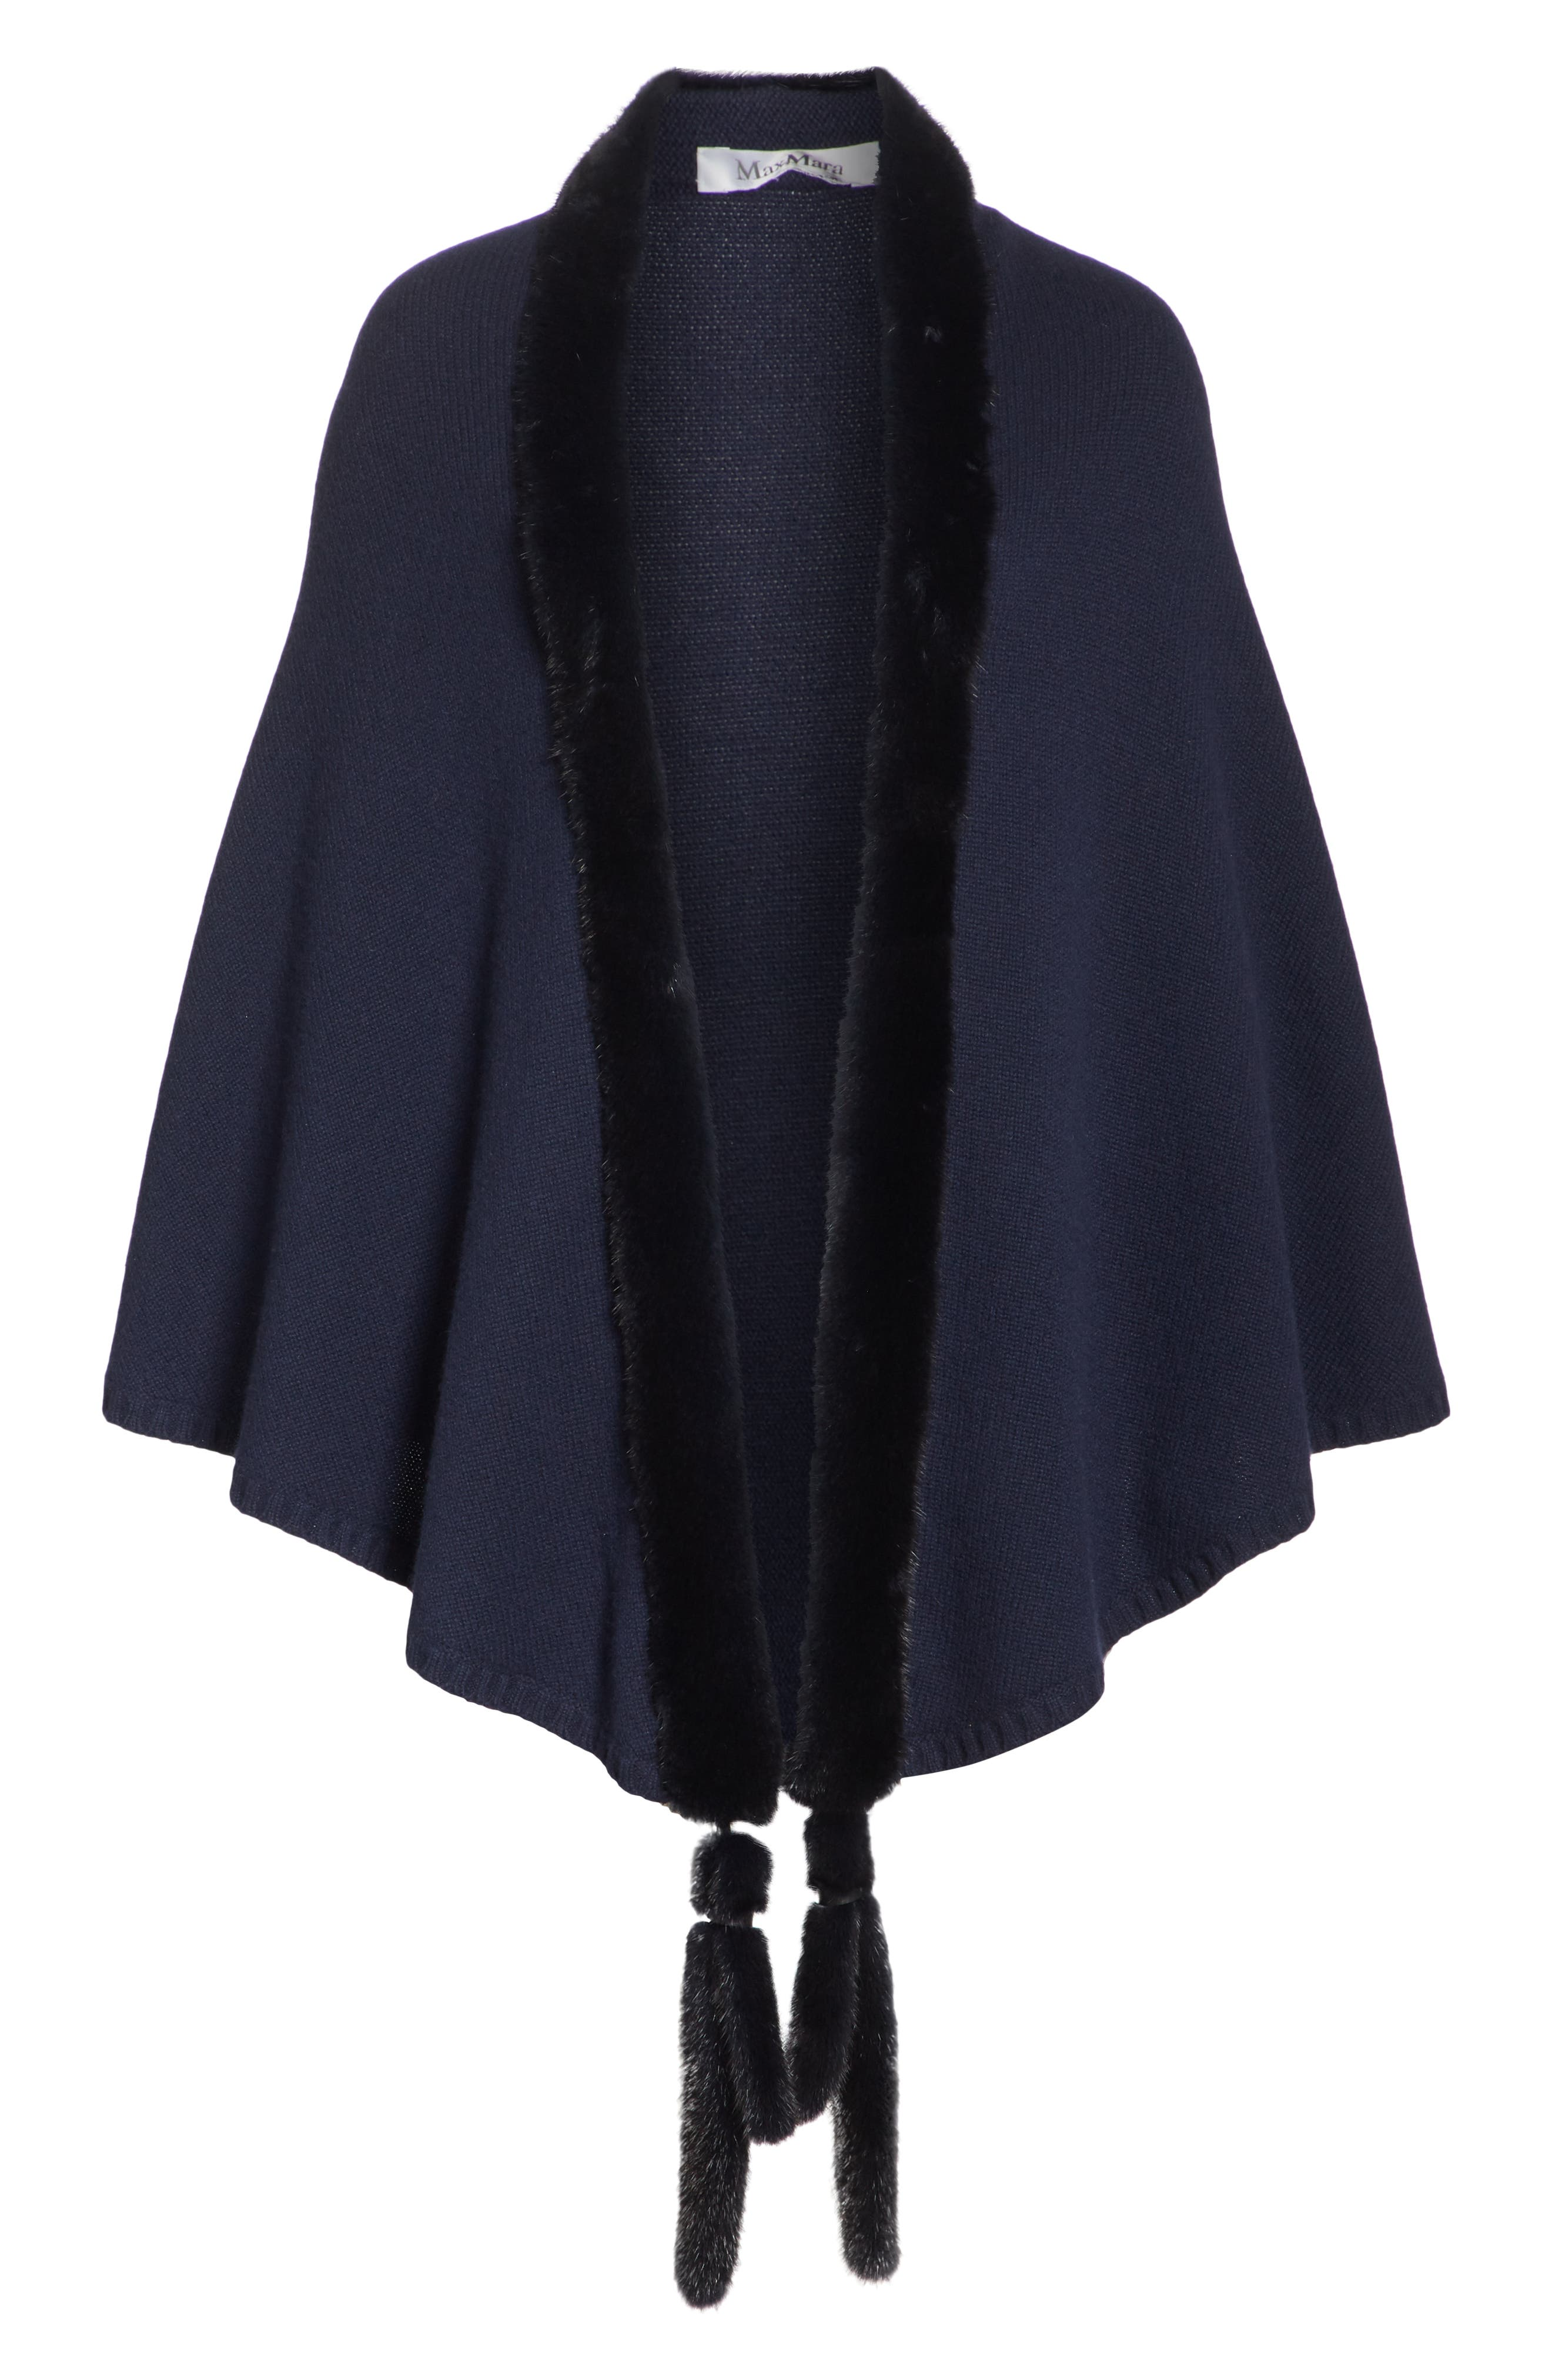 Cashmere & Genuine Mink Fur Wrap,                             Alternate thumbnail 6, color,                             ULTRAMARINE NAVY